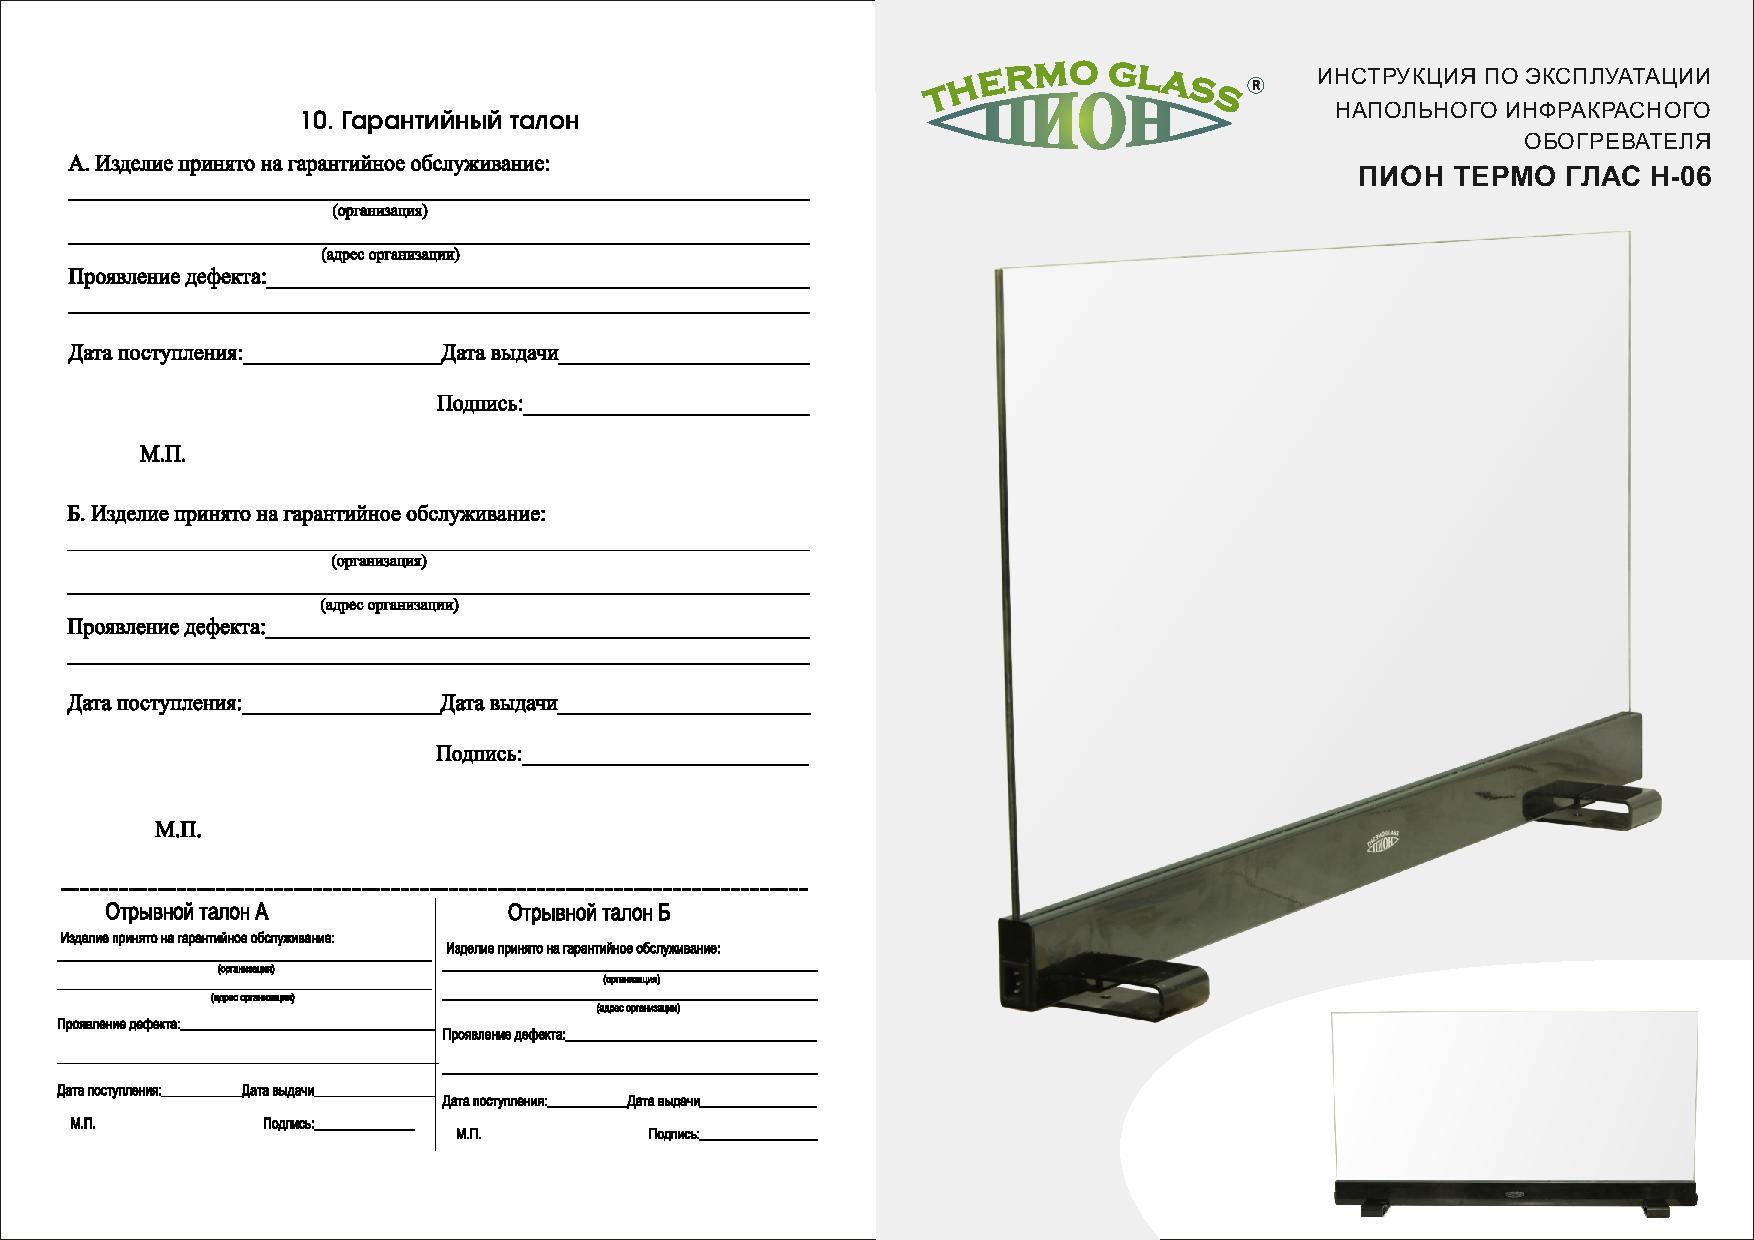 Инструкция на конвективно-инфракрасные обогреватели ПИОН THERMO GLASS (Термо Гласc) Н-06